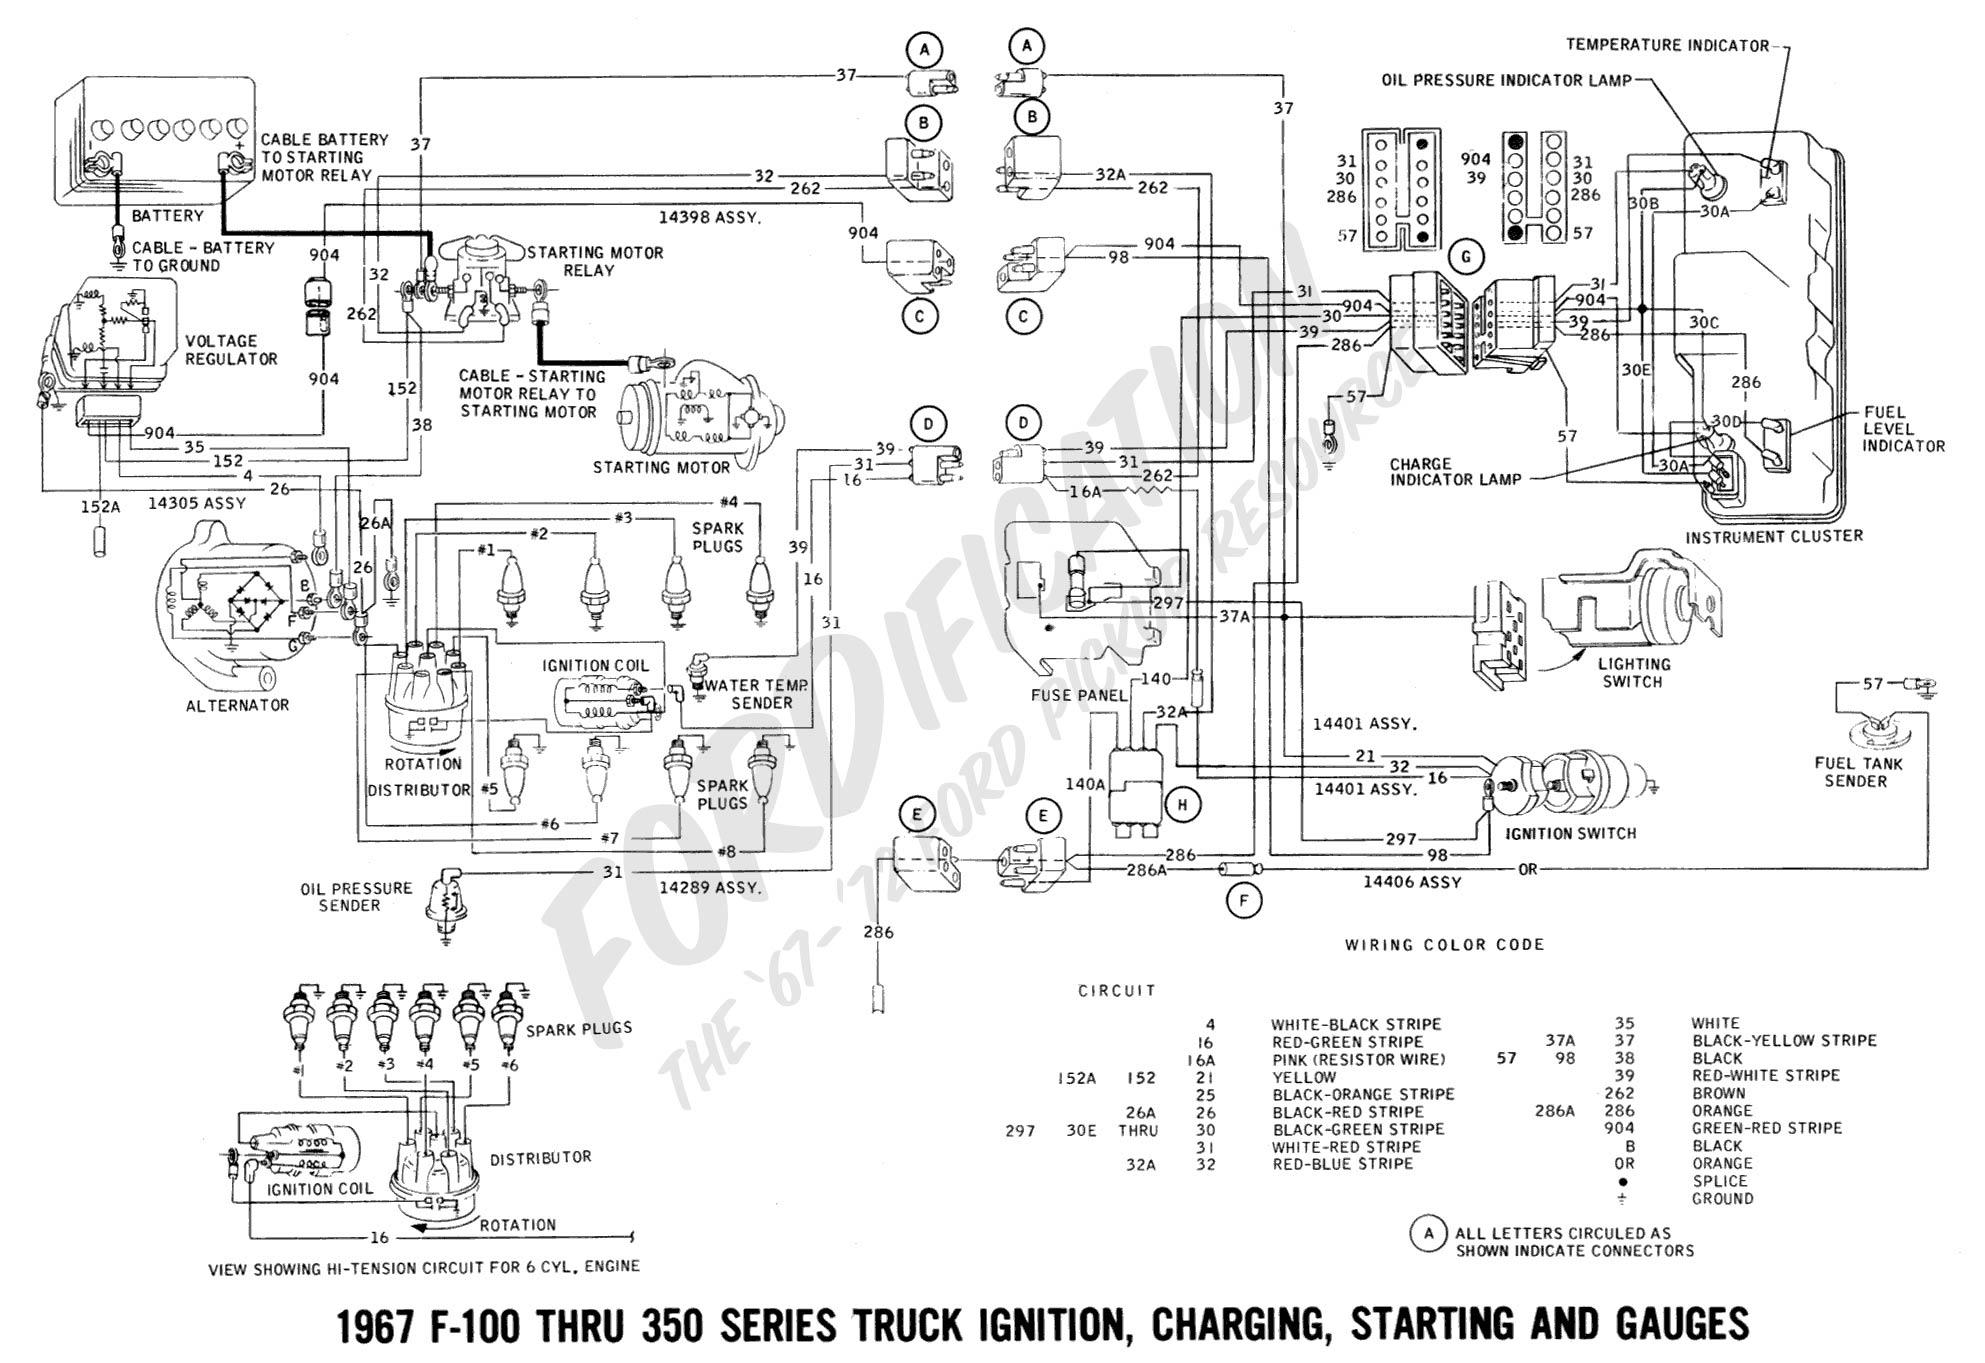 1988 Dodge Dakota Fuse Diagram